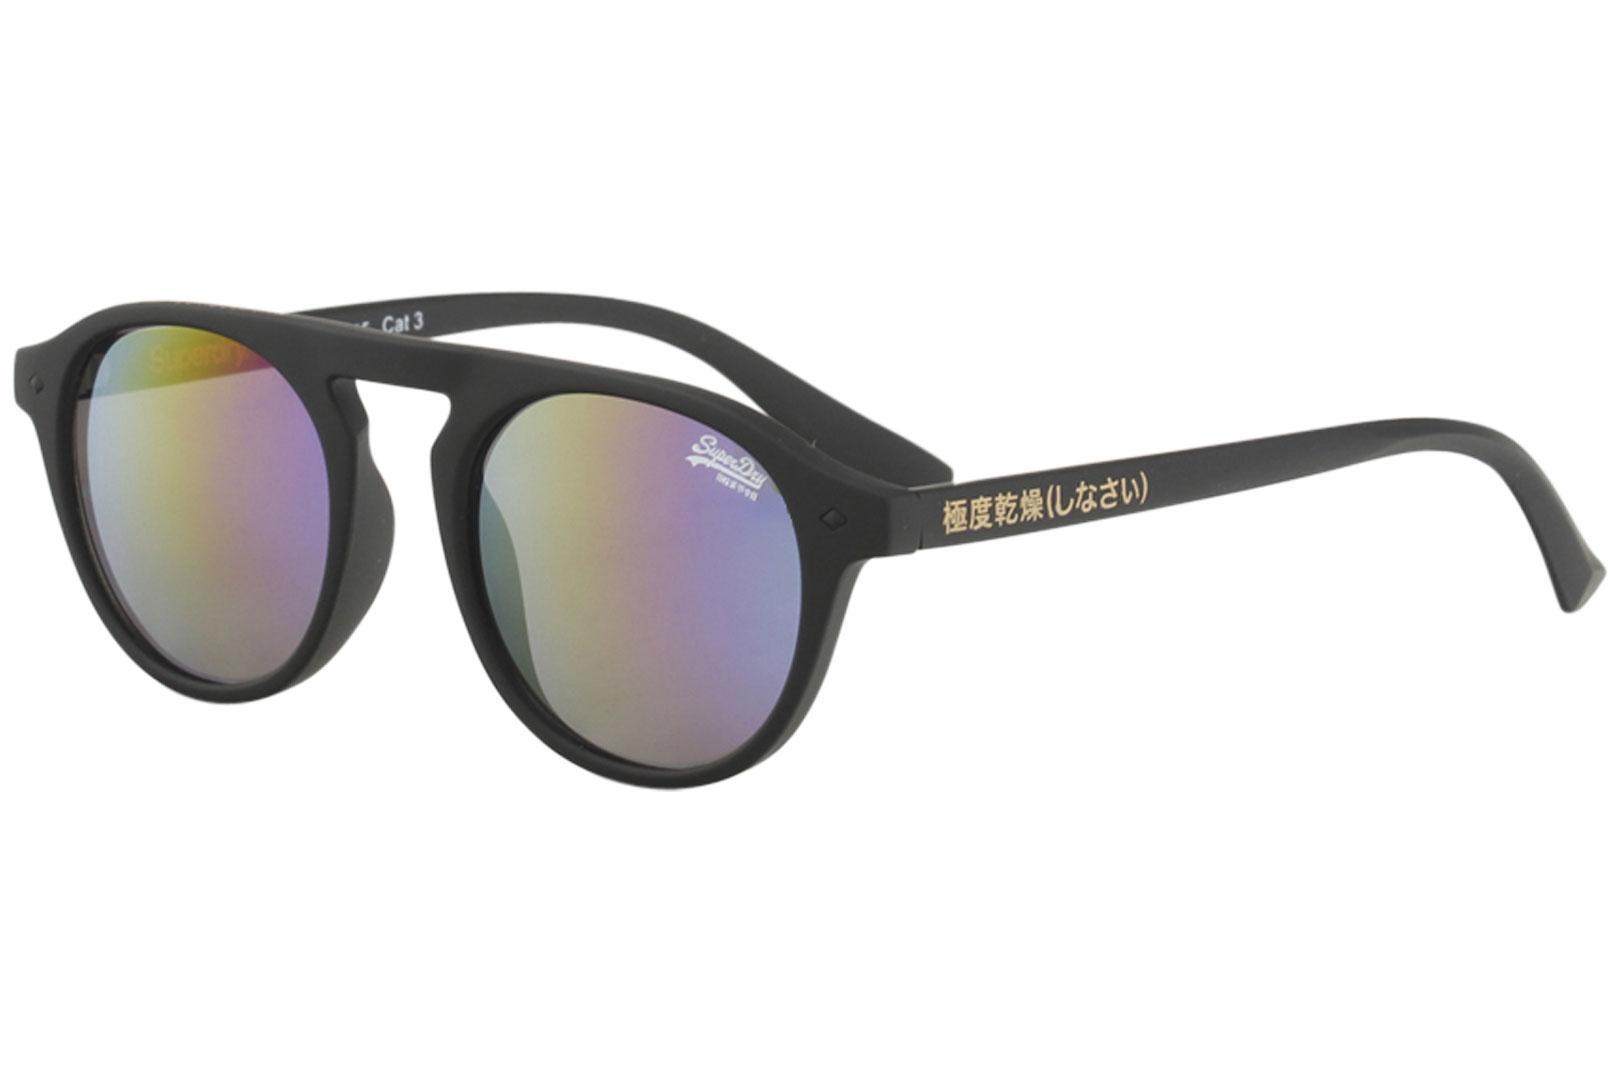 Image of Superdry SDS Palm Springs Fashion Round Sunglasses - Rubber Black/Grey Multi Flash   104 -  Lens 49 Bridge 19 Temple 145mm